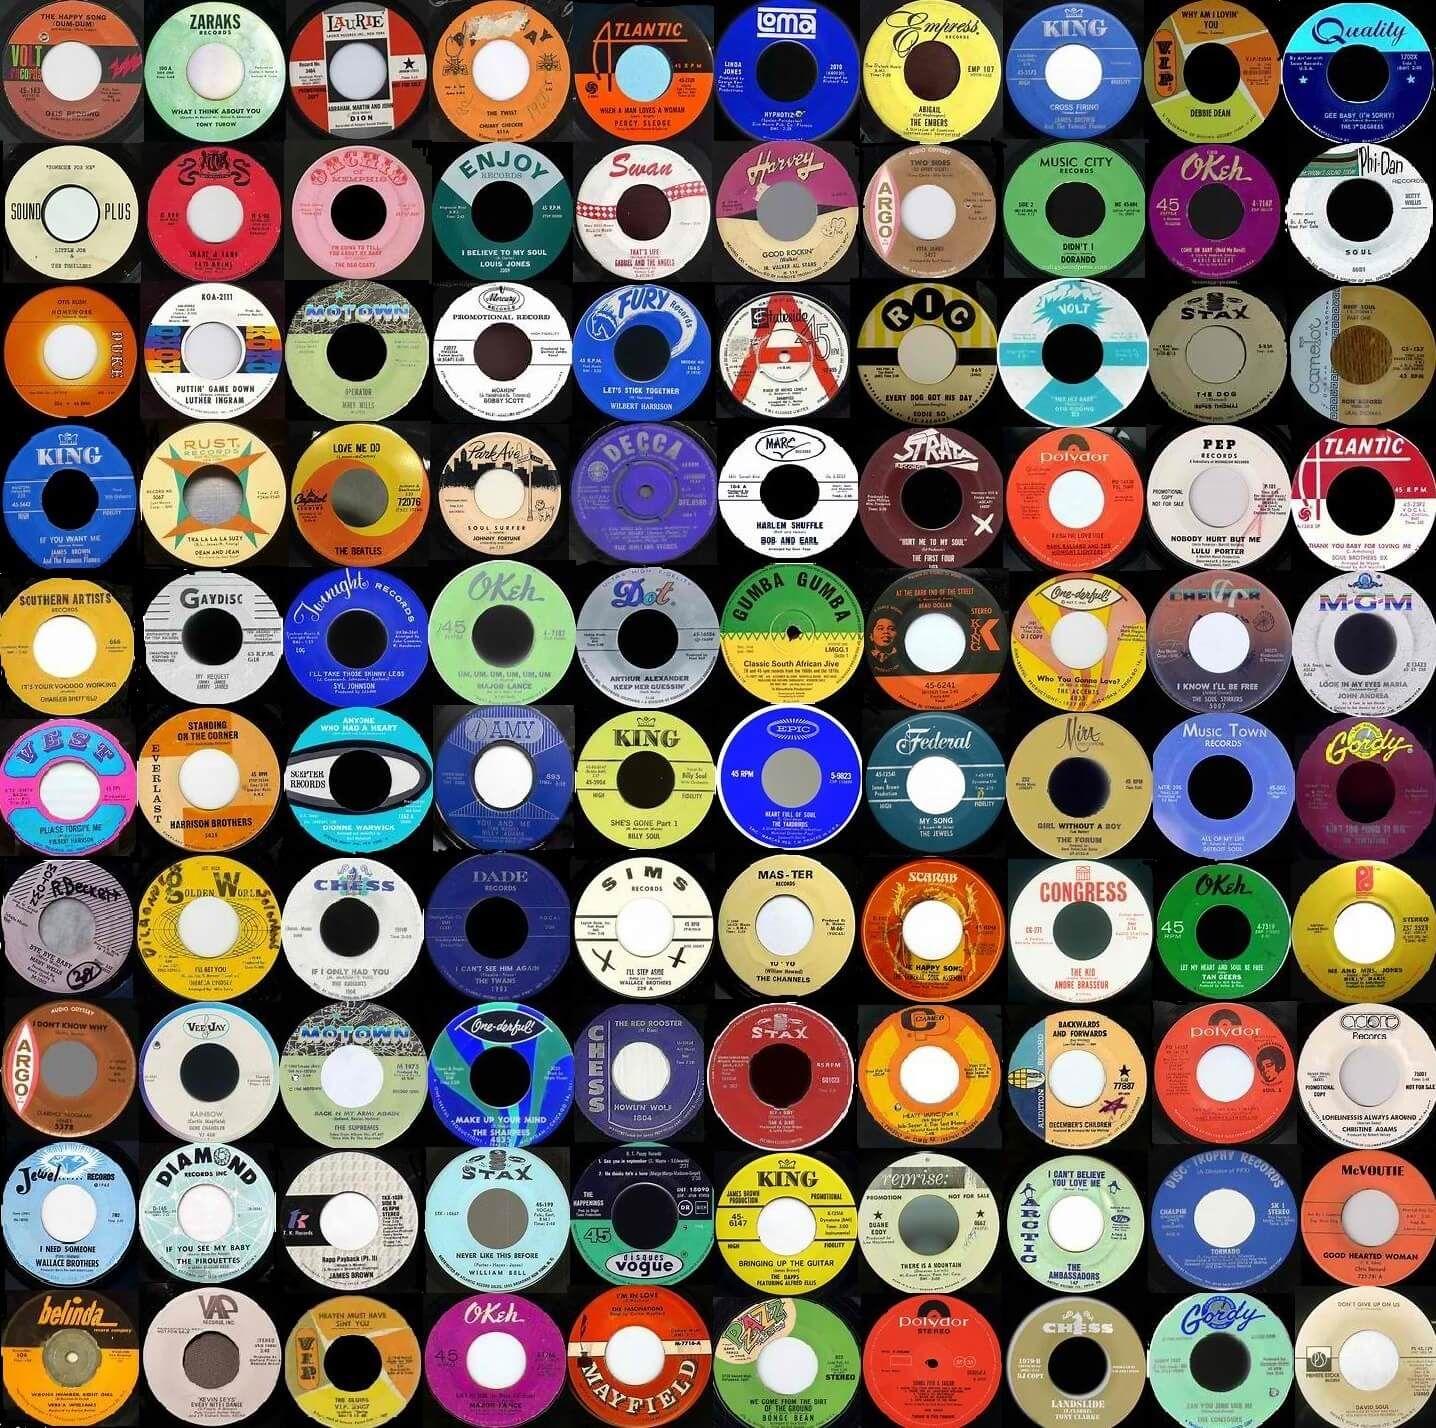 Soul Years R&B Music Portal With Free RnB, Soul, Funk Mp3 Downloads